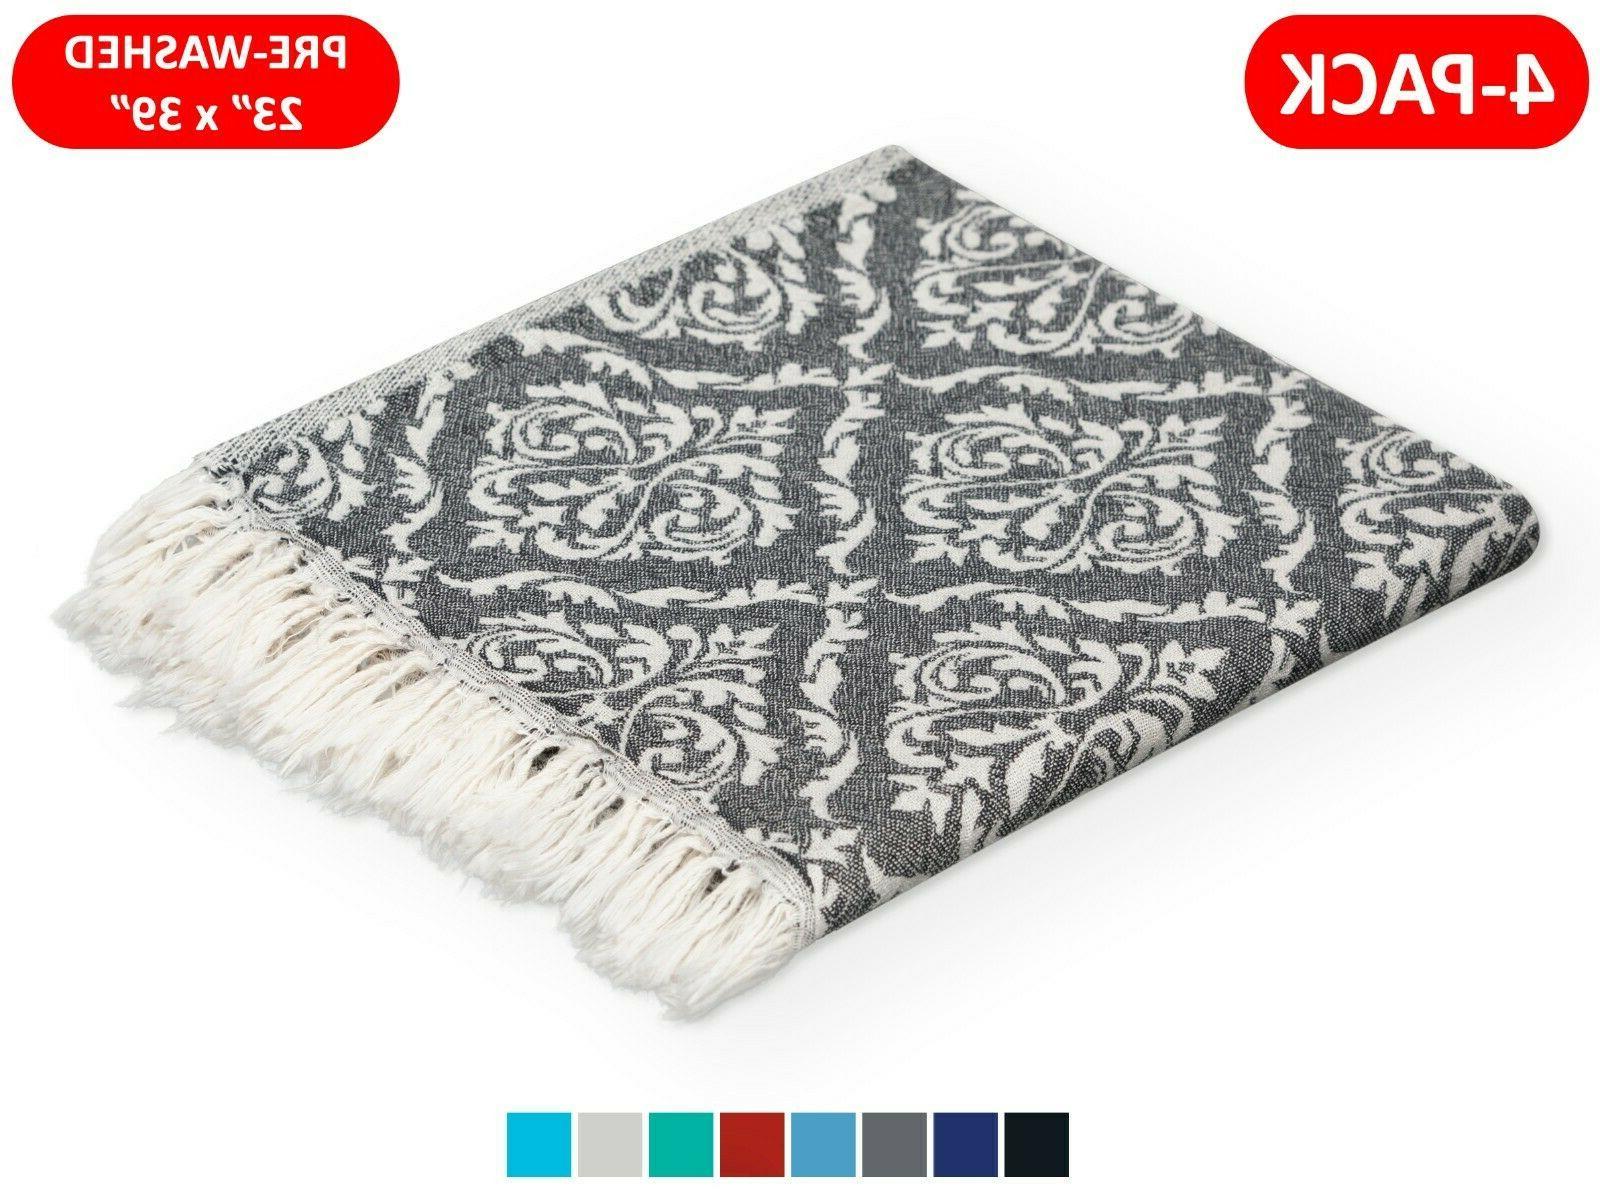 100% TURKISH COTTON HAND TOWELS 23x39 FACE HAIR BATH GUEST